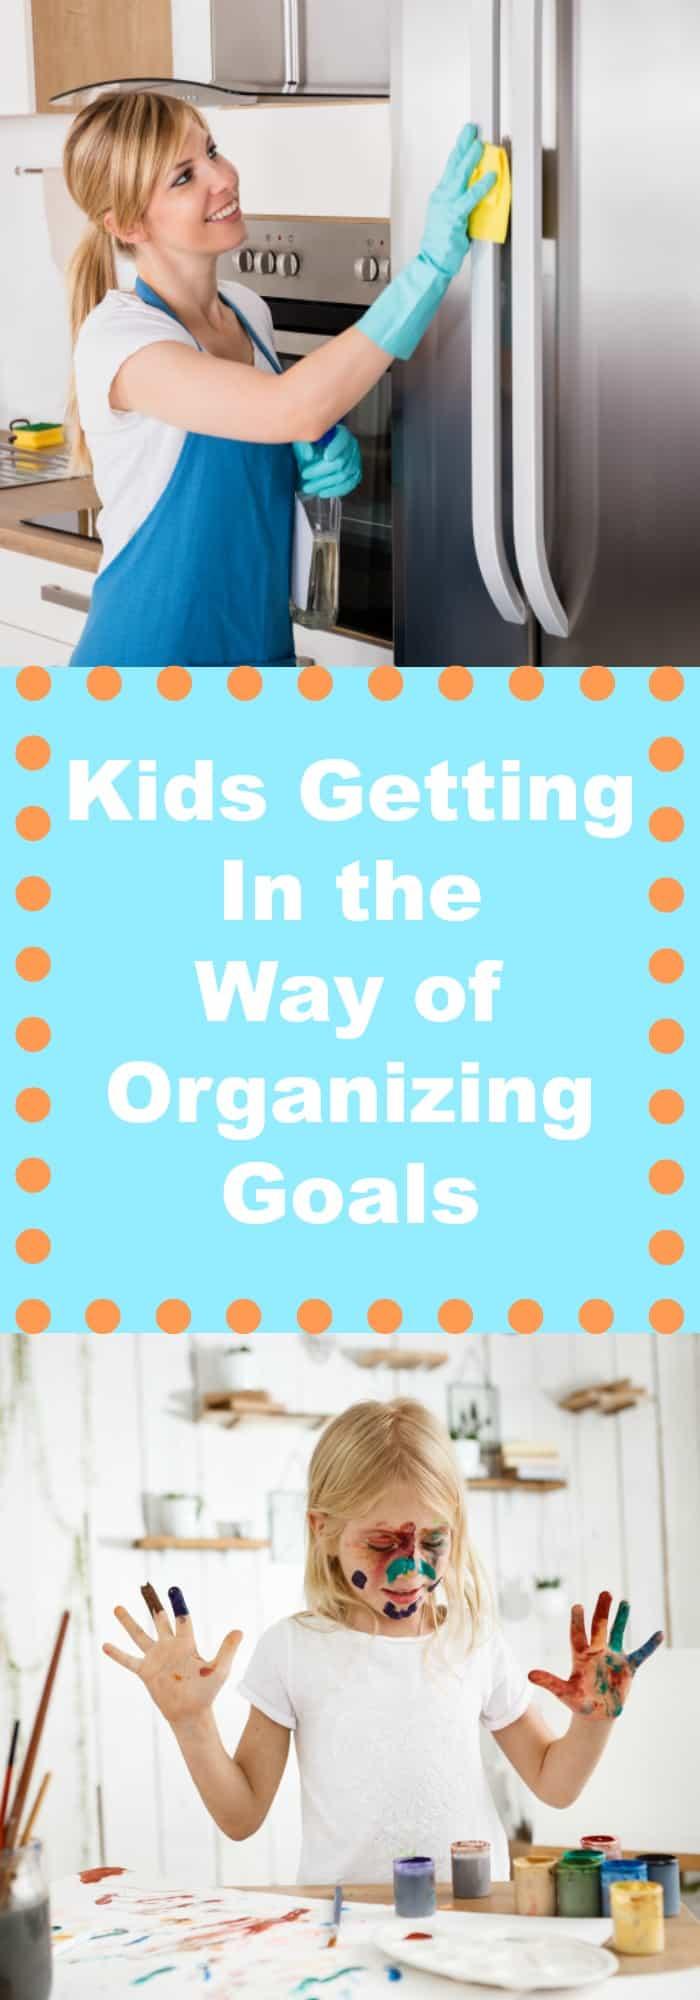 Organization-Kids Getting in the Way of Organizing Goals-Organized Mom